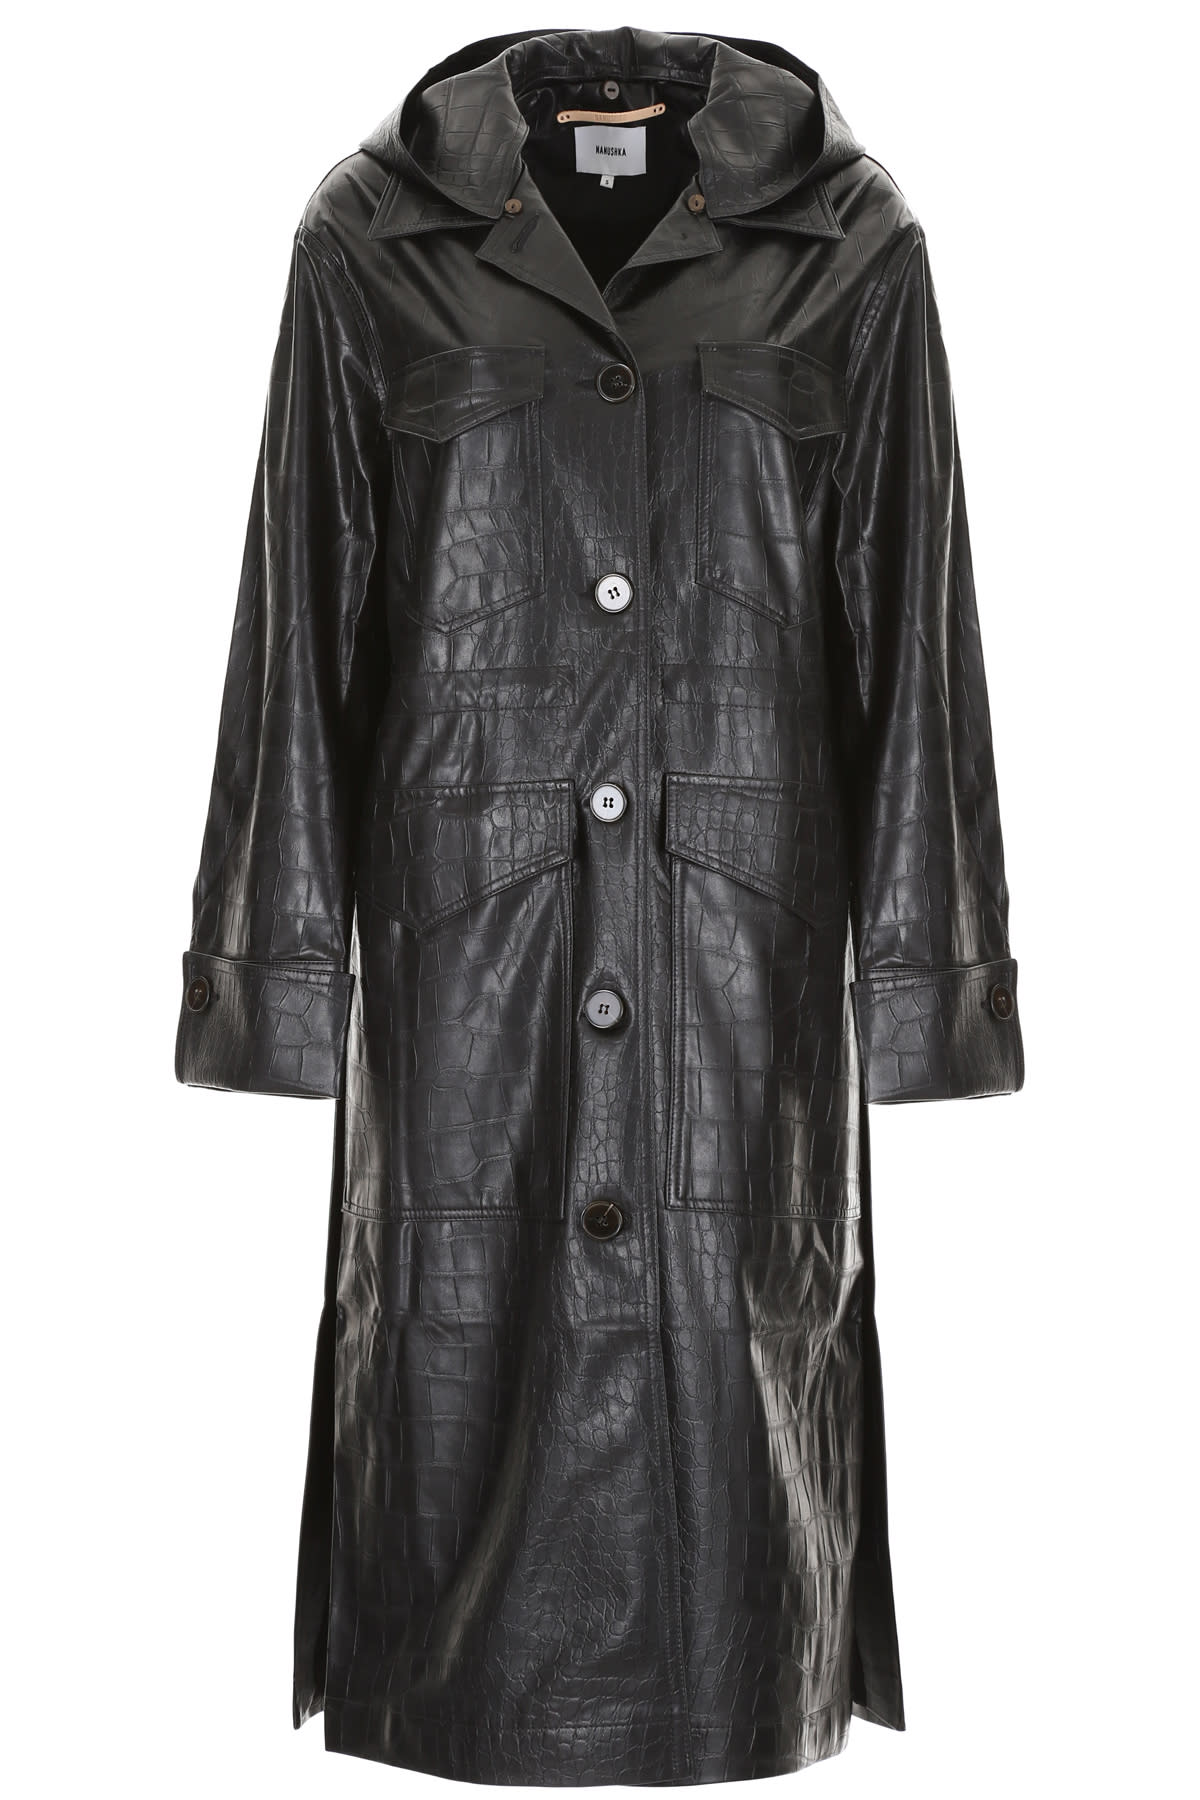 Nanushka Gus Coat